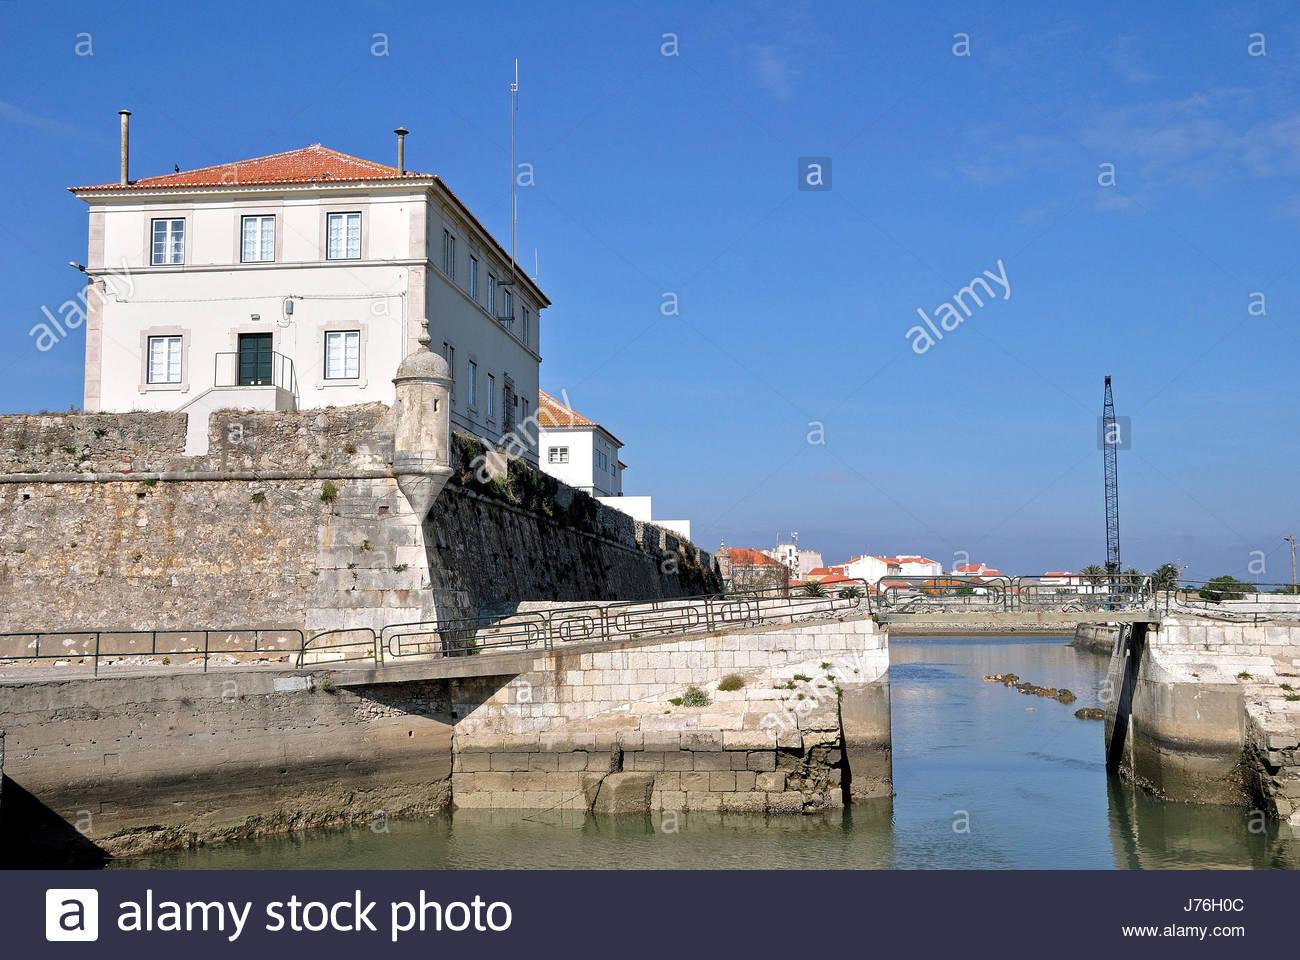 port authority peniche - Stock Image